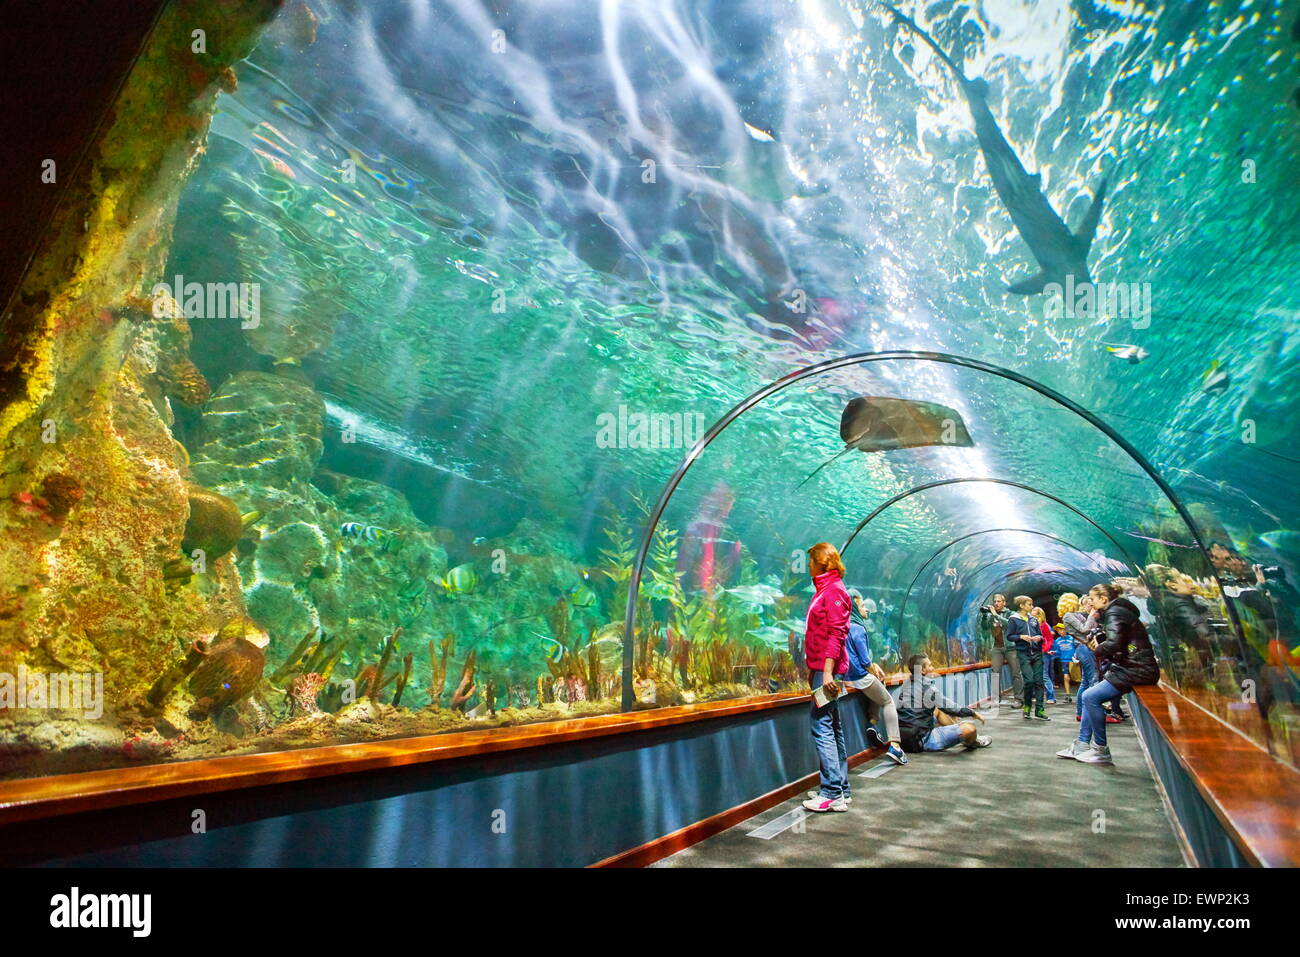 Aquarium in Loro Parque, Puerto de la Cruz, Tenerife, Canary Islands, Spain Stock Photo